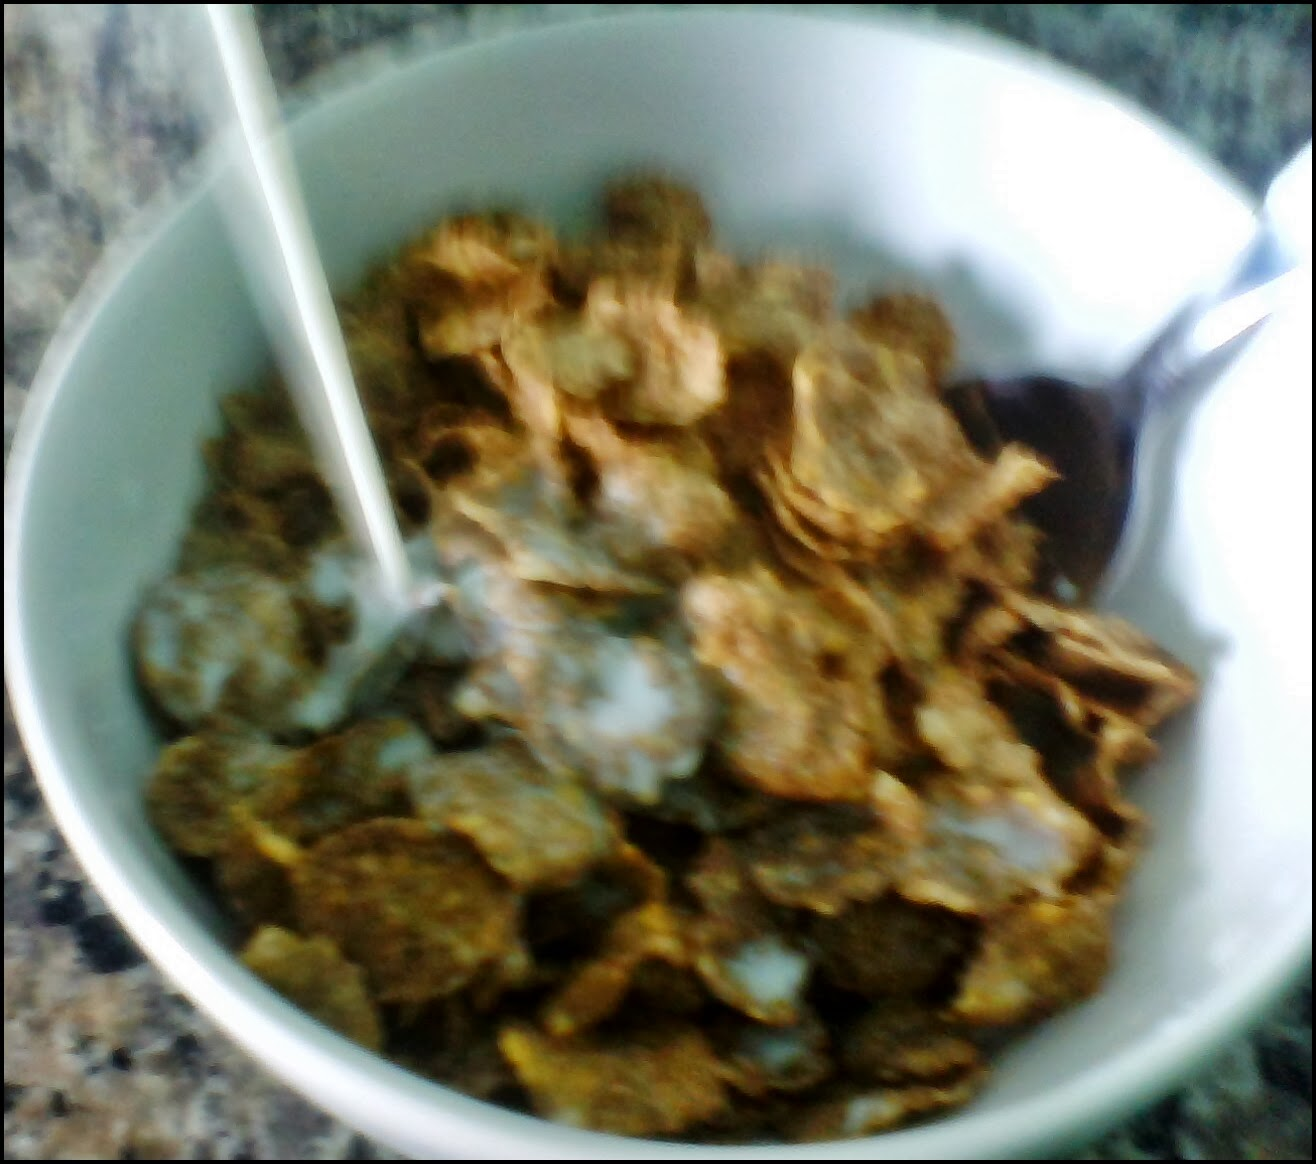 cereal integral rico em fibras minerais, 8 vitaminas.